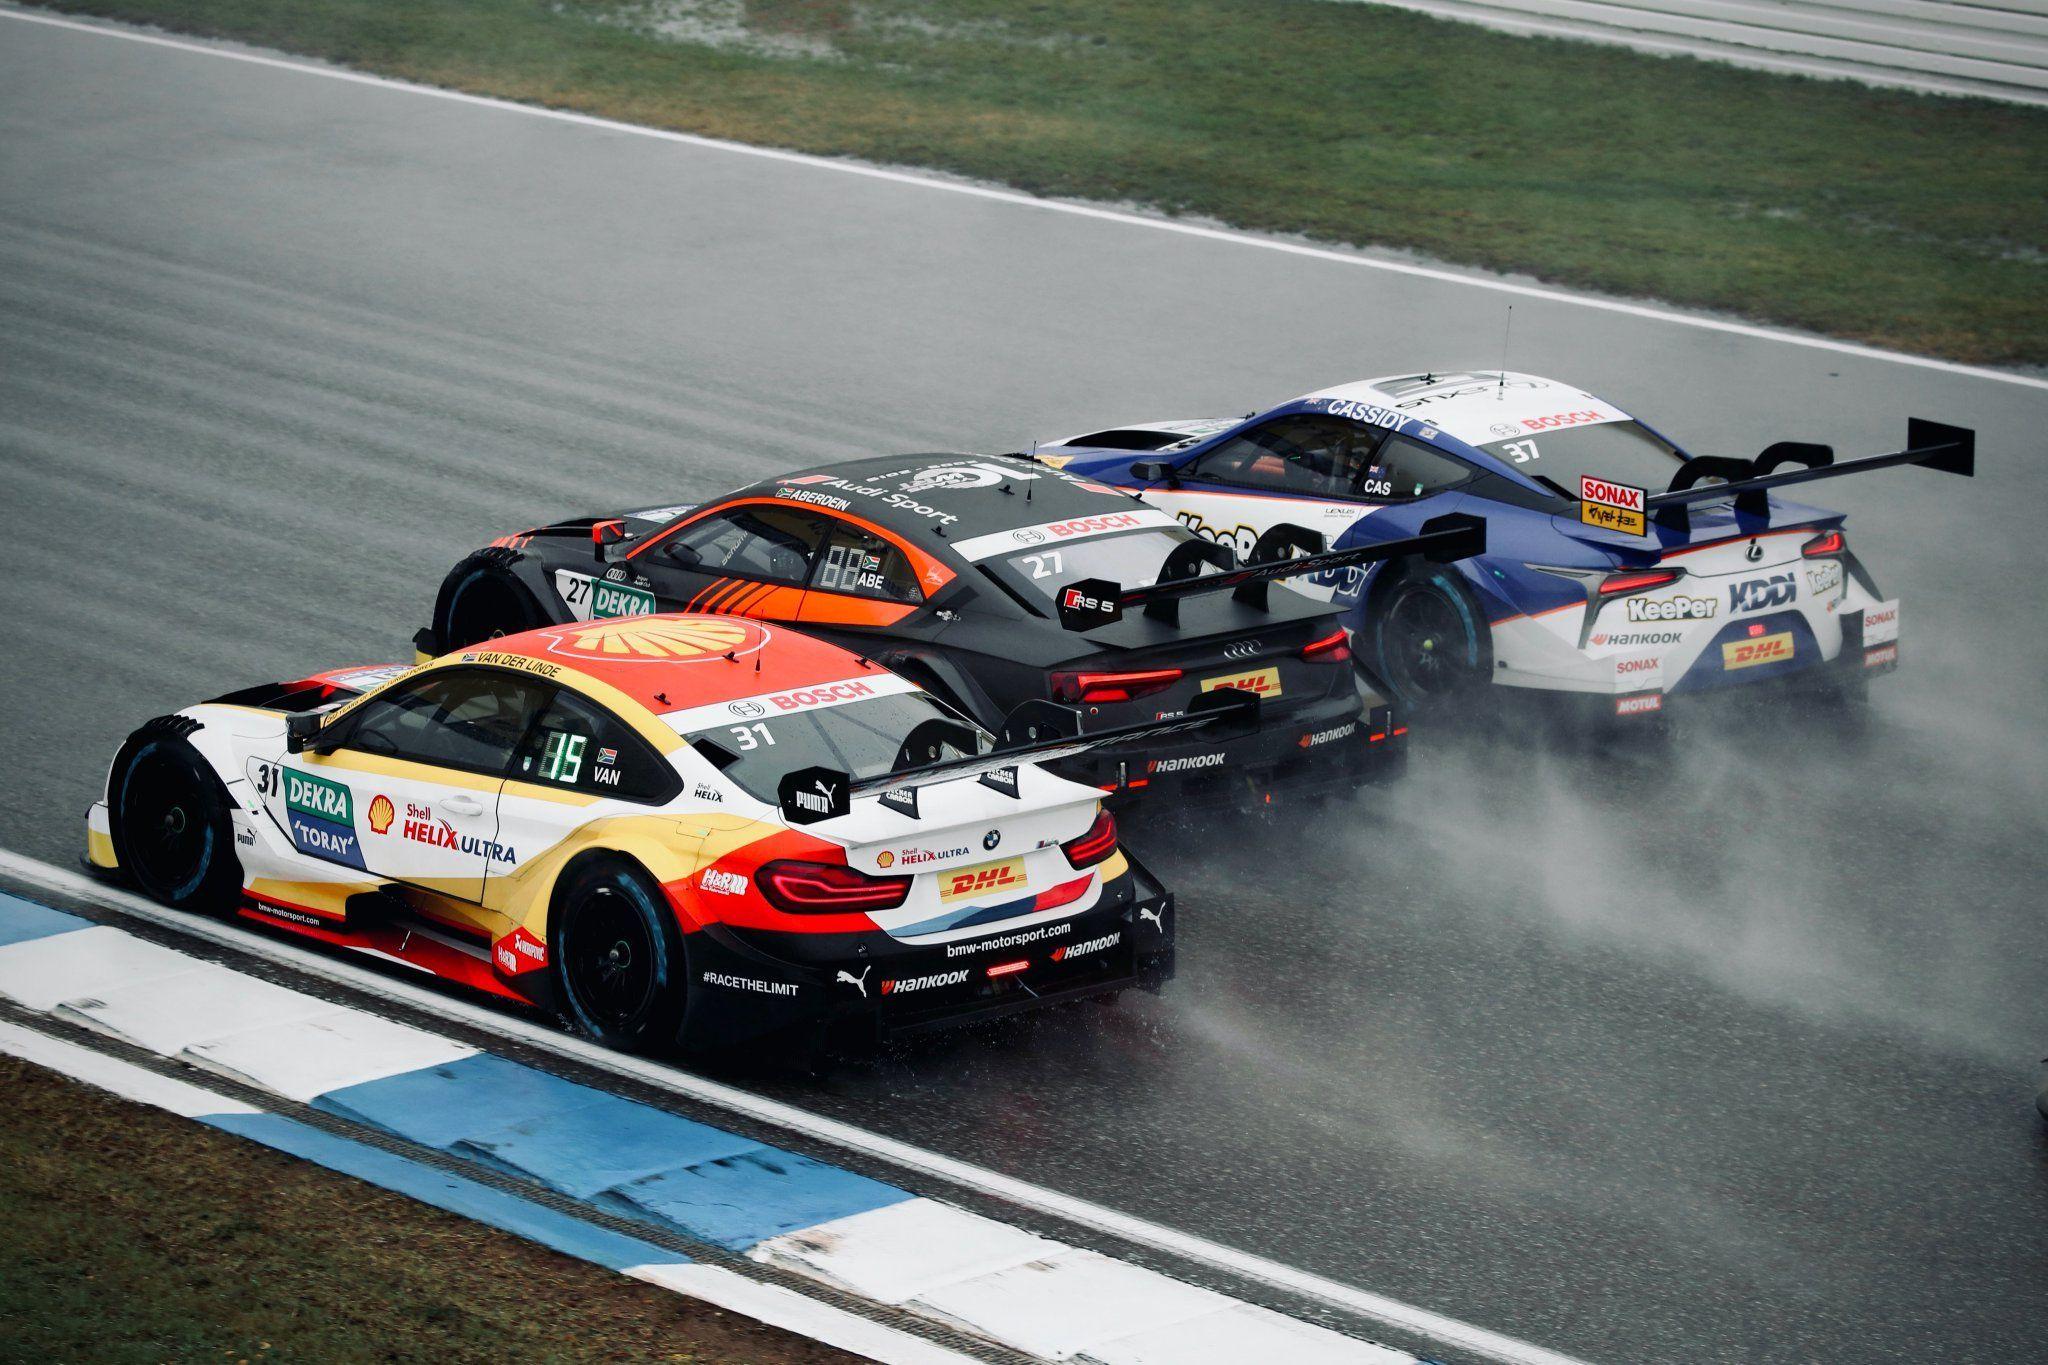 Dtm On Twitter Sports Car Racing Grand Prix Cars Race Cars